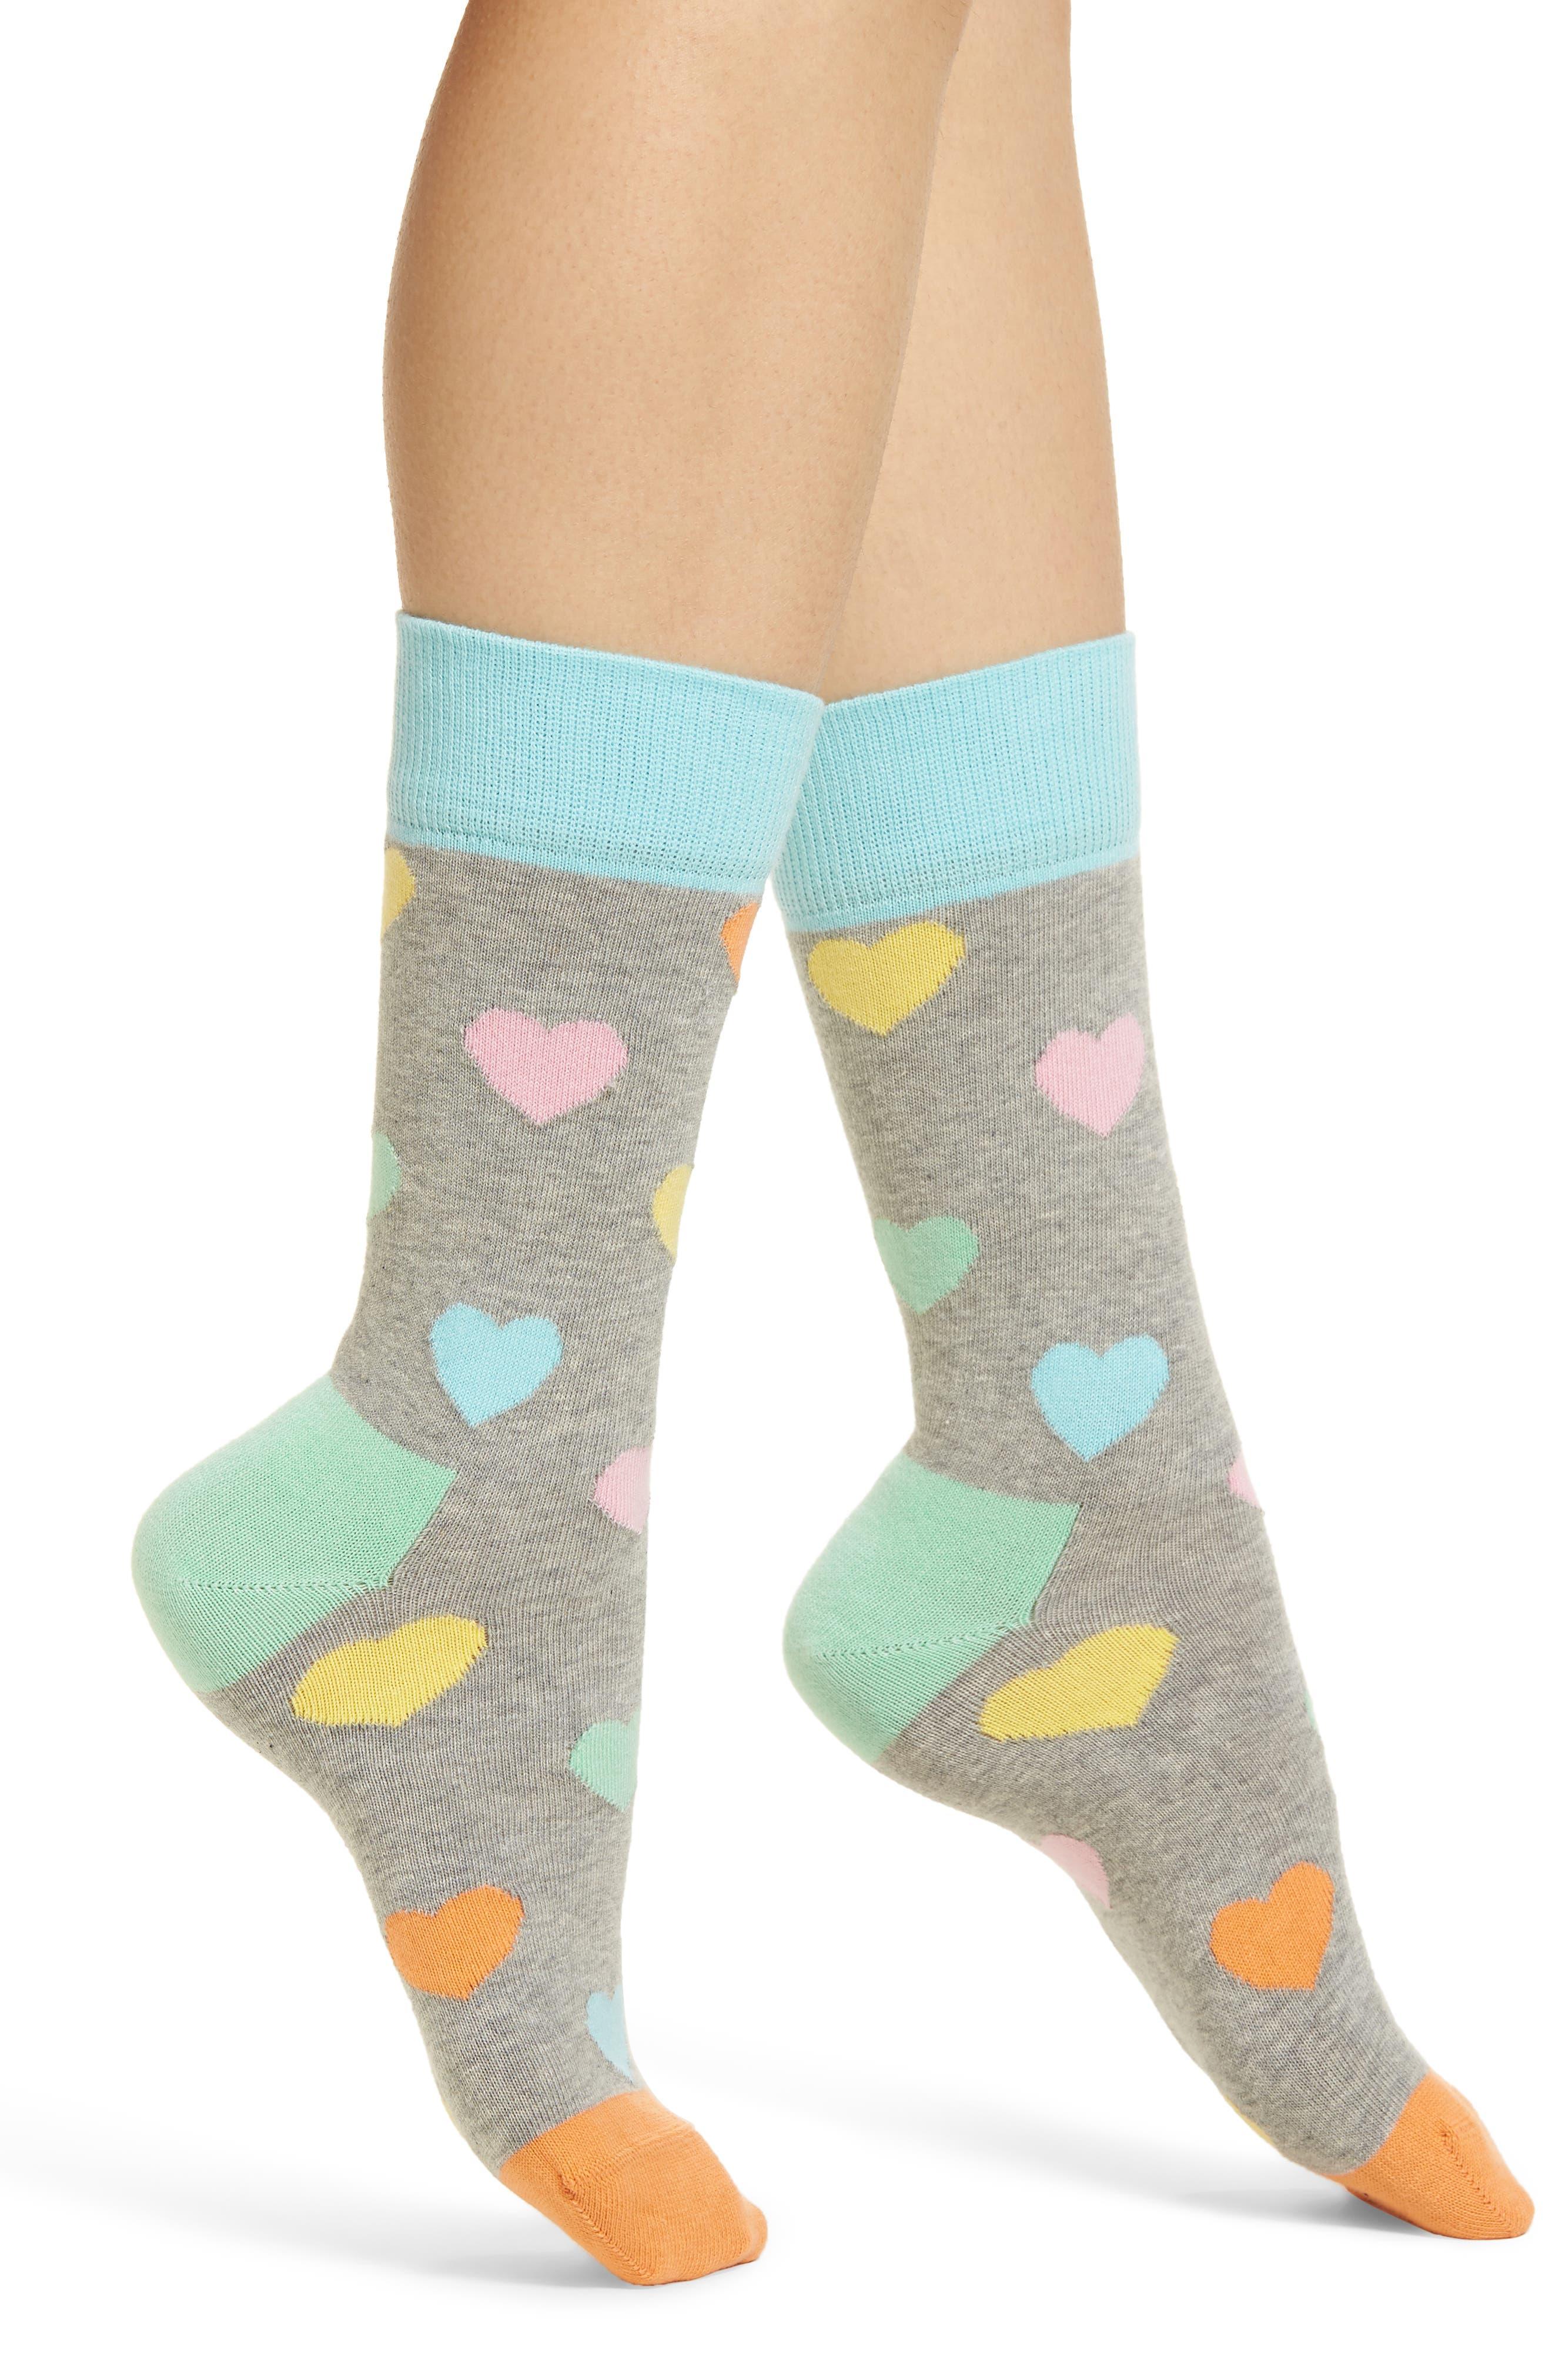 Happy Socks Heart Crew Socks